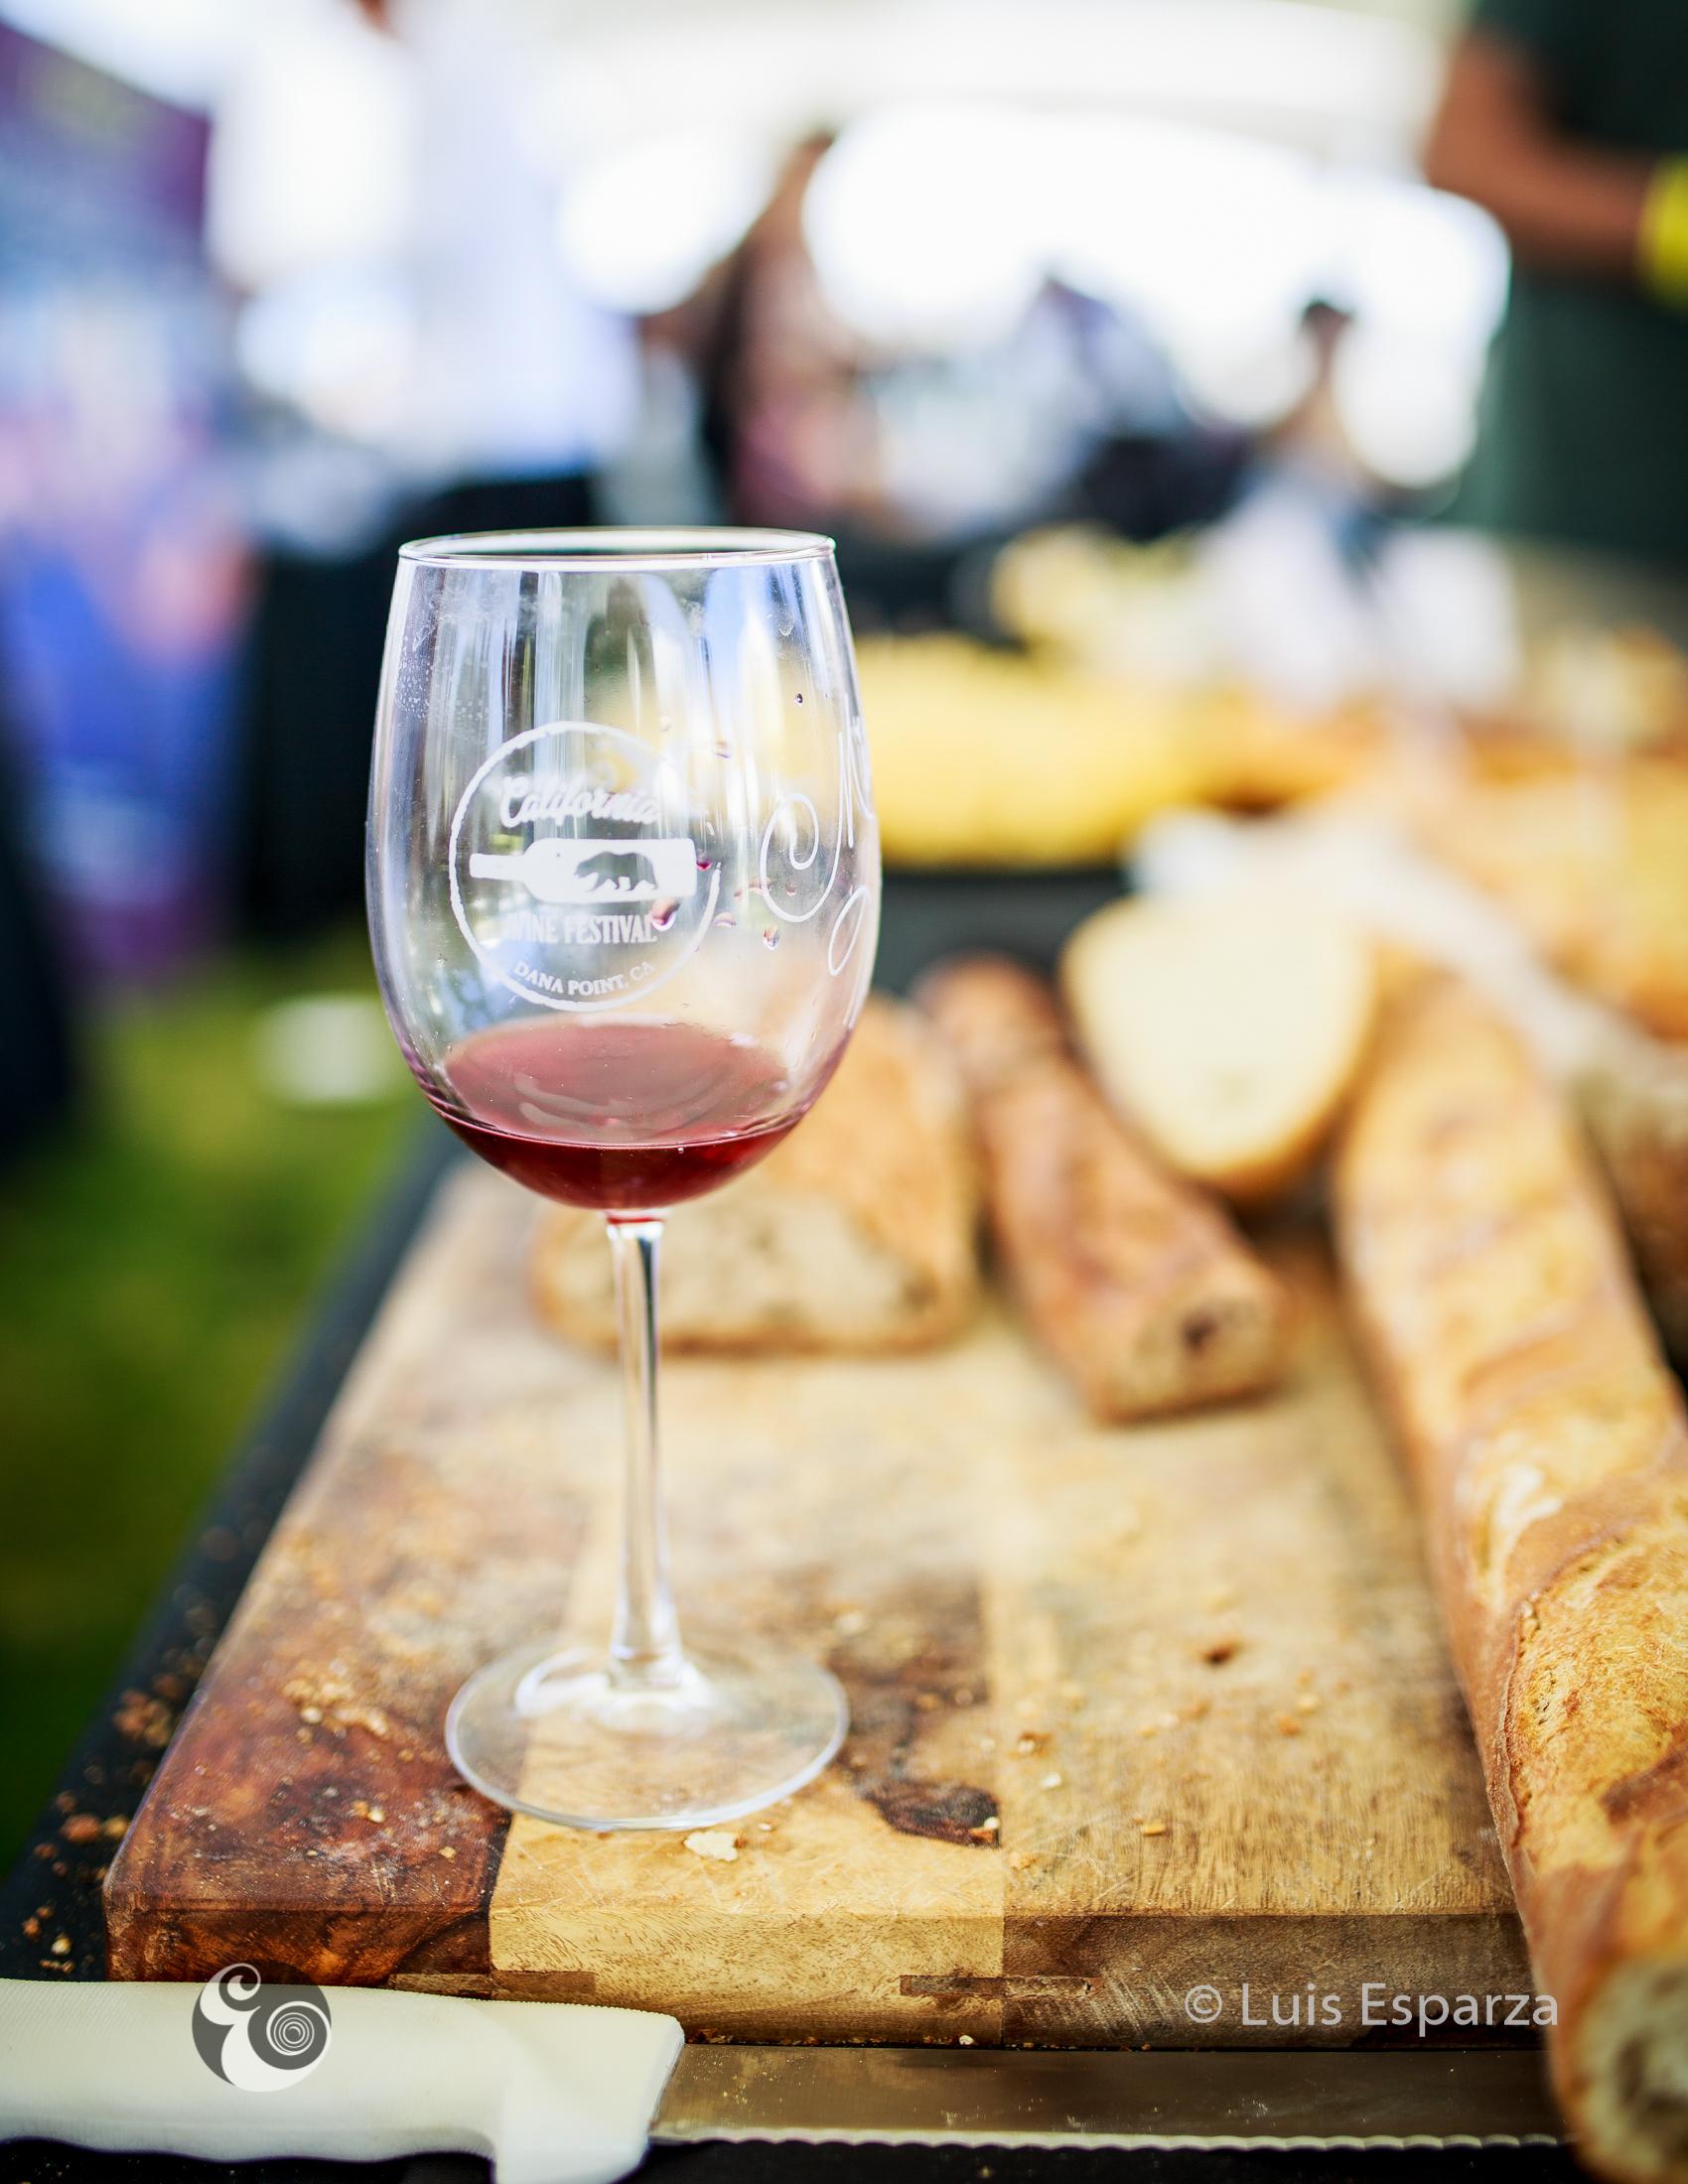 9th-Annual-California-Wine-Festival---Orange-County-in-Dana-Point_32__1508532114__cawf-md-12.jpg